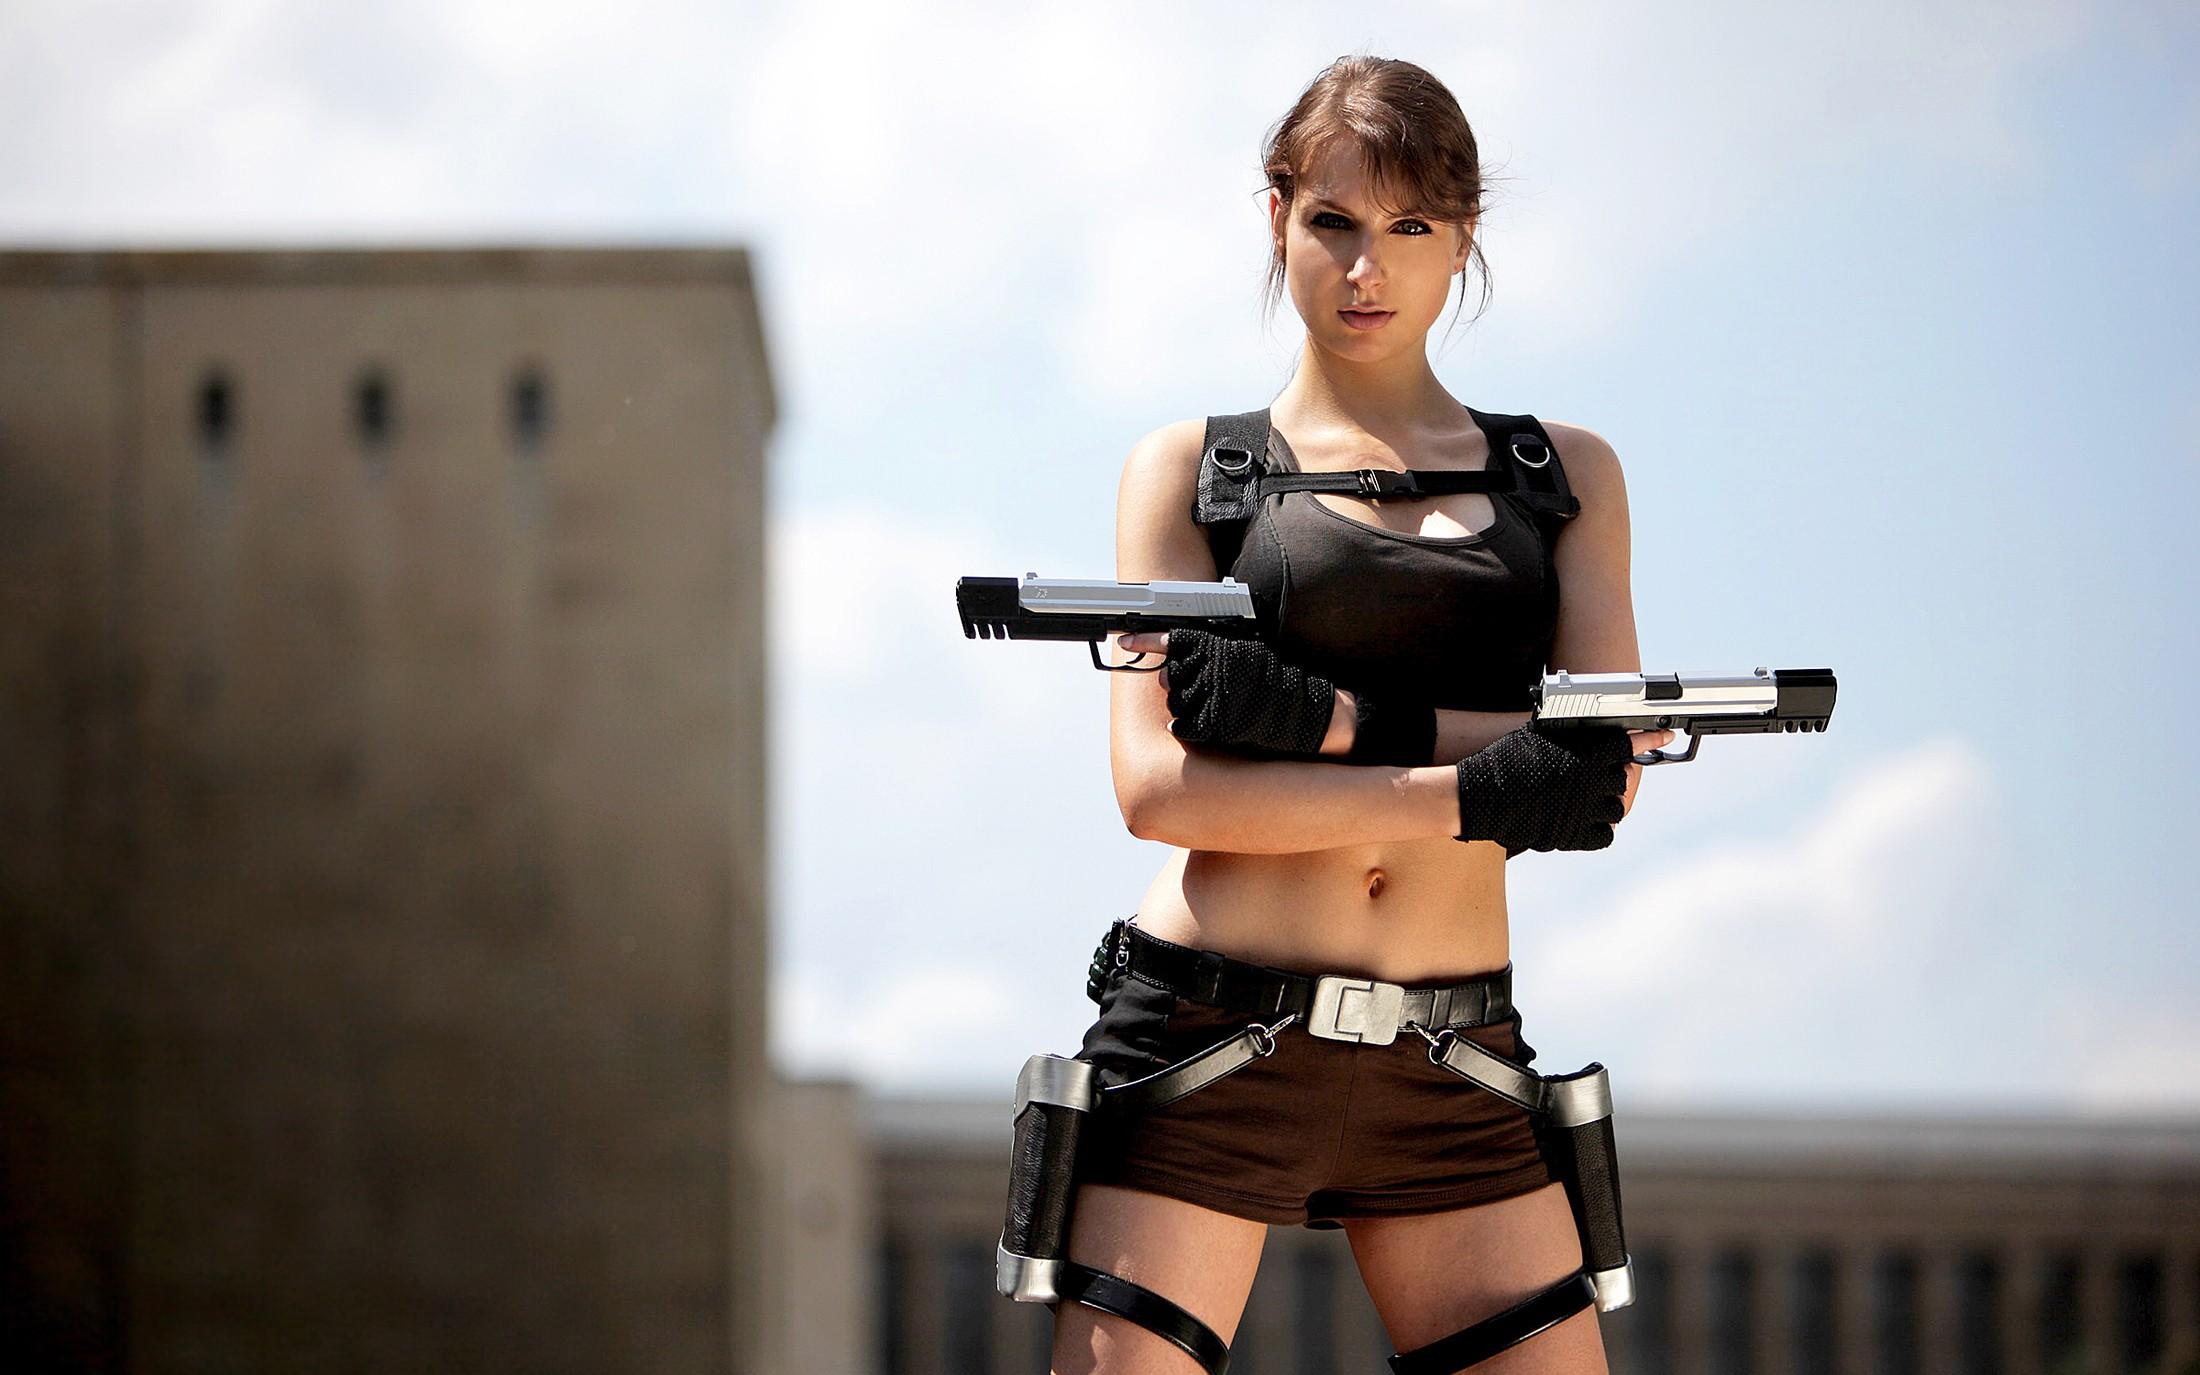 La bella Lara Croft - 2200x1375